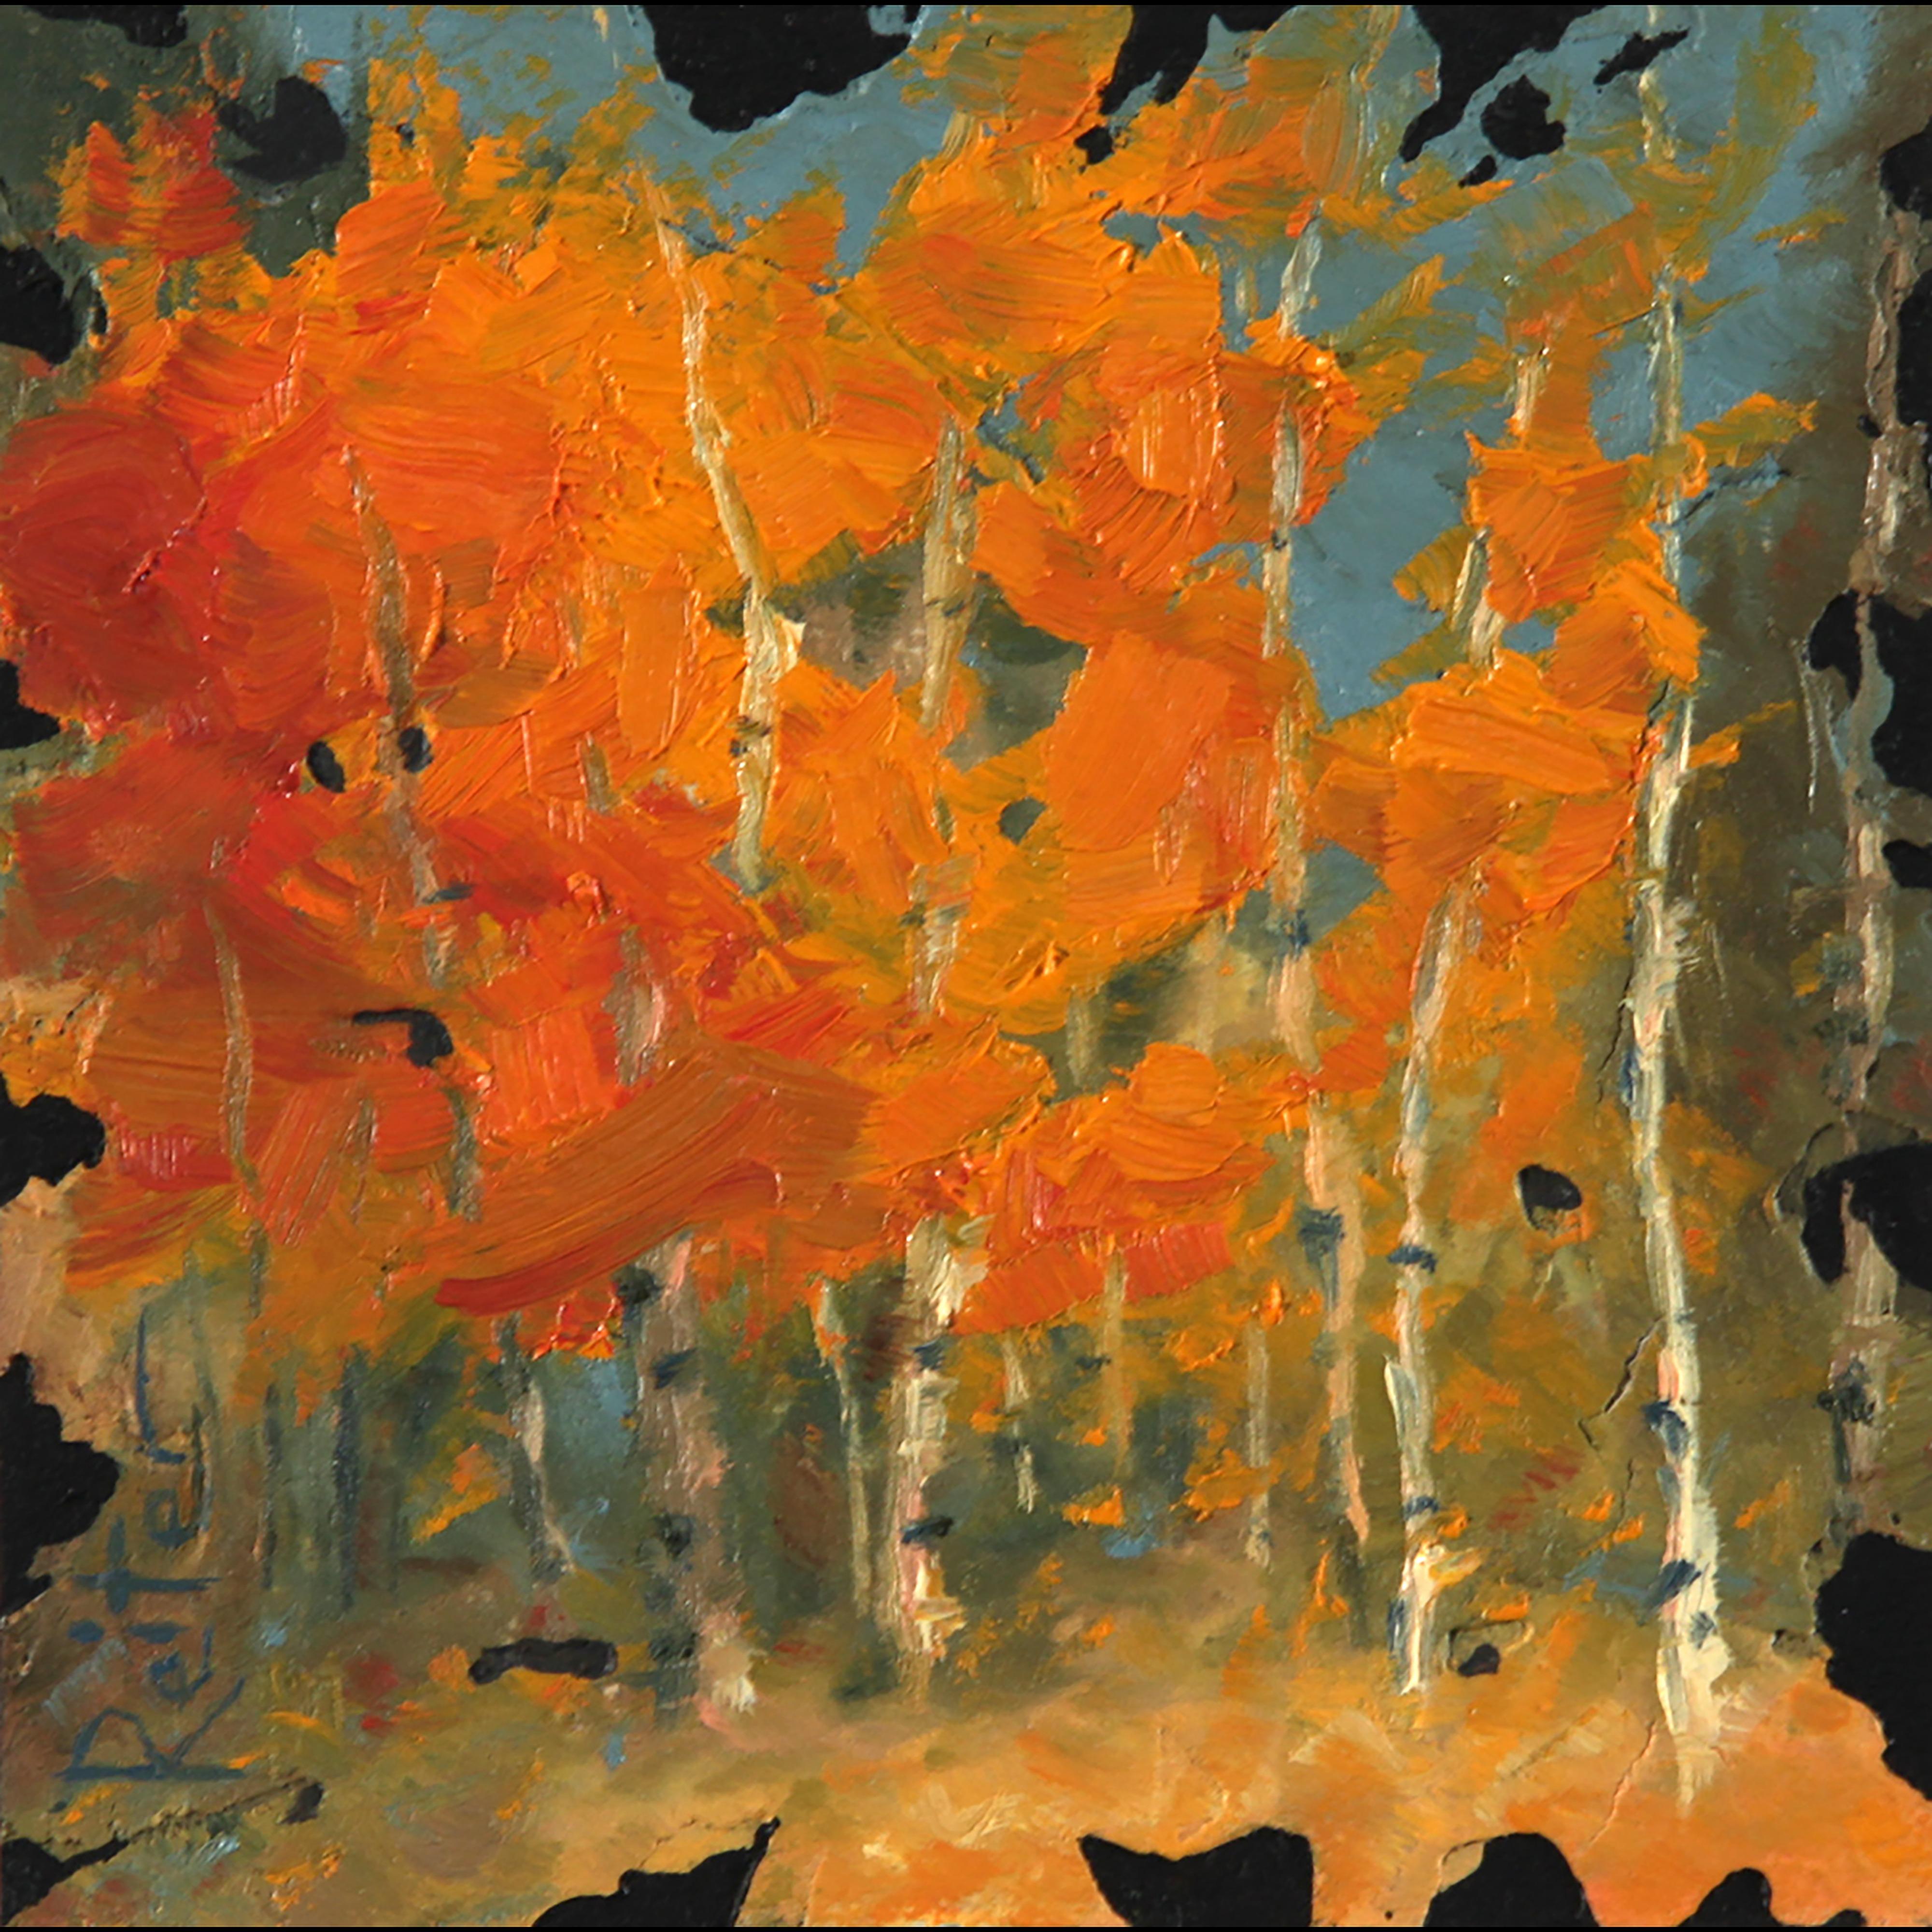 """Autumn Aspens VI"" (6) by Dave Reiter | ArtworkNetwork.com"